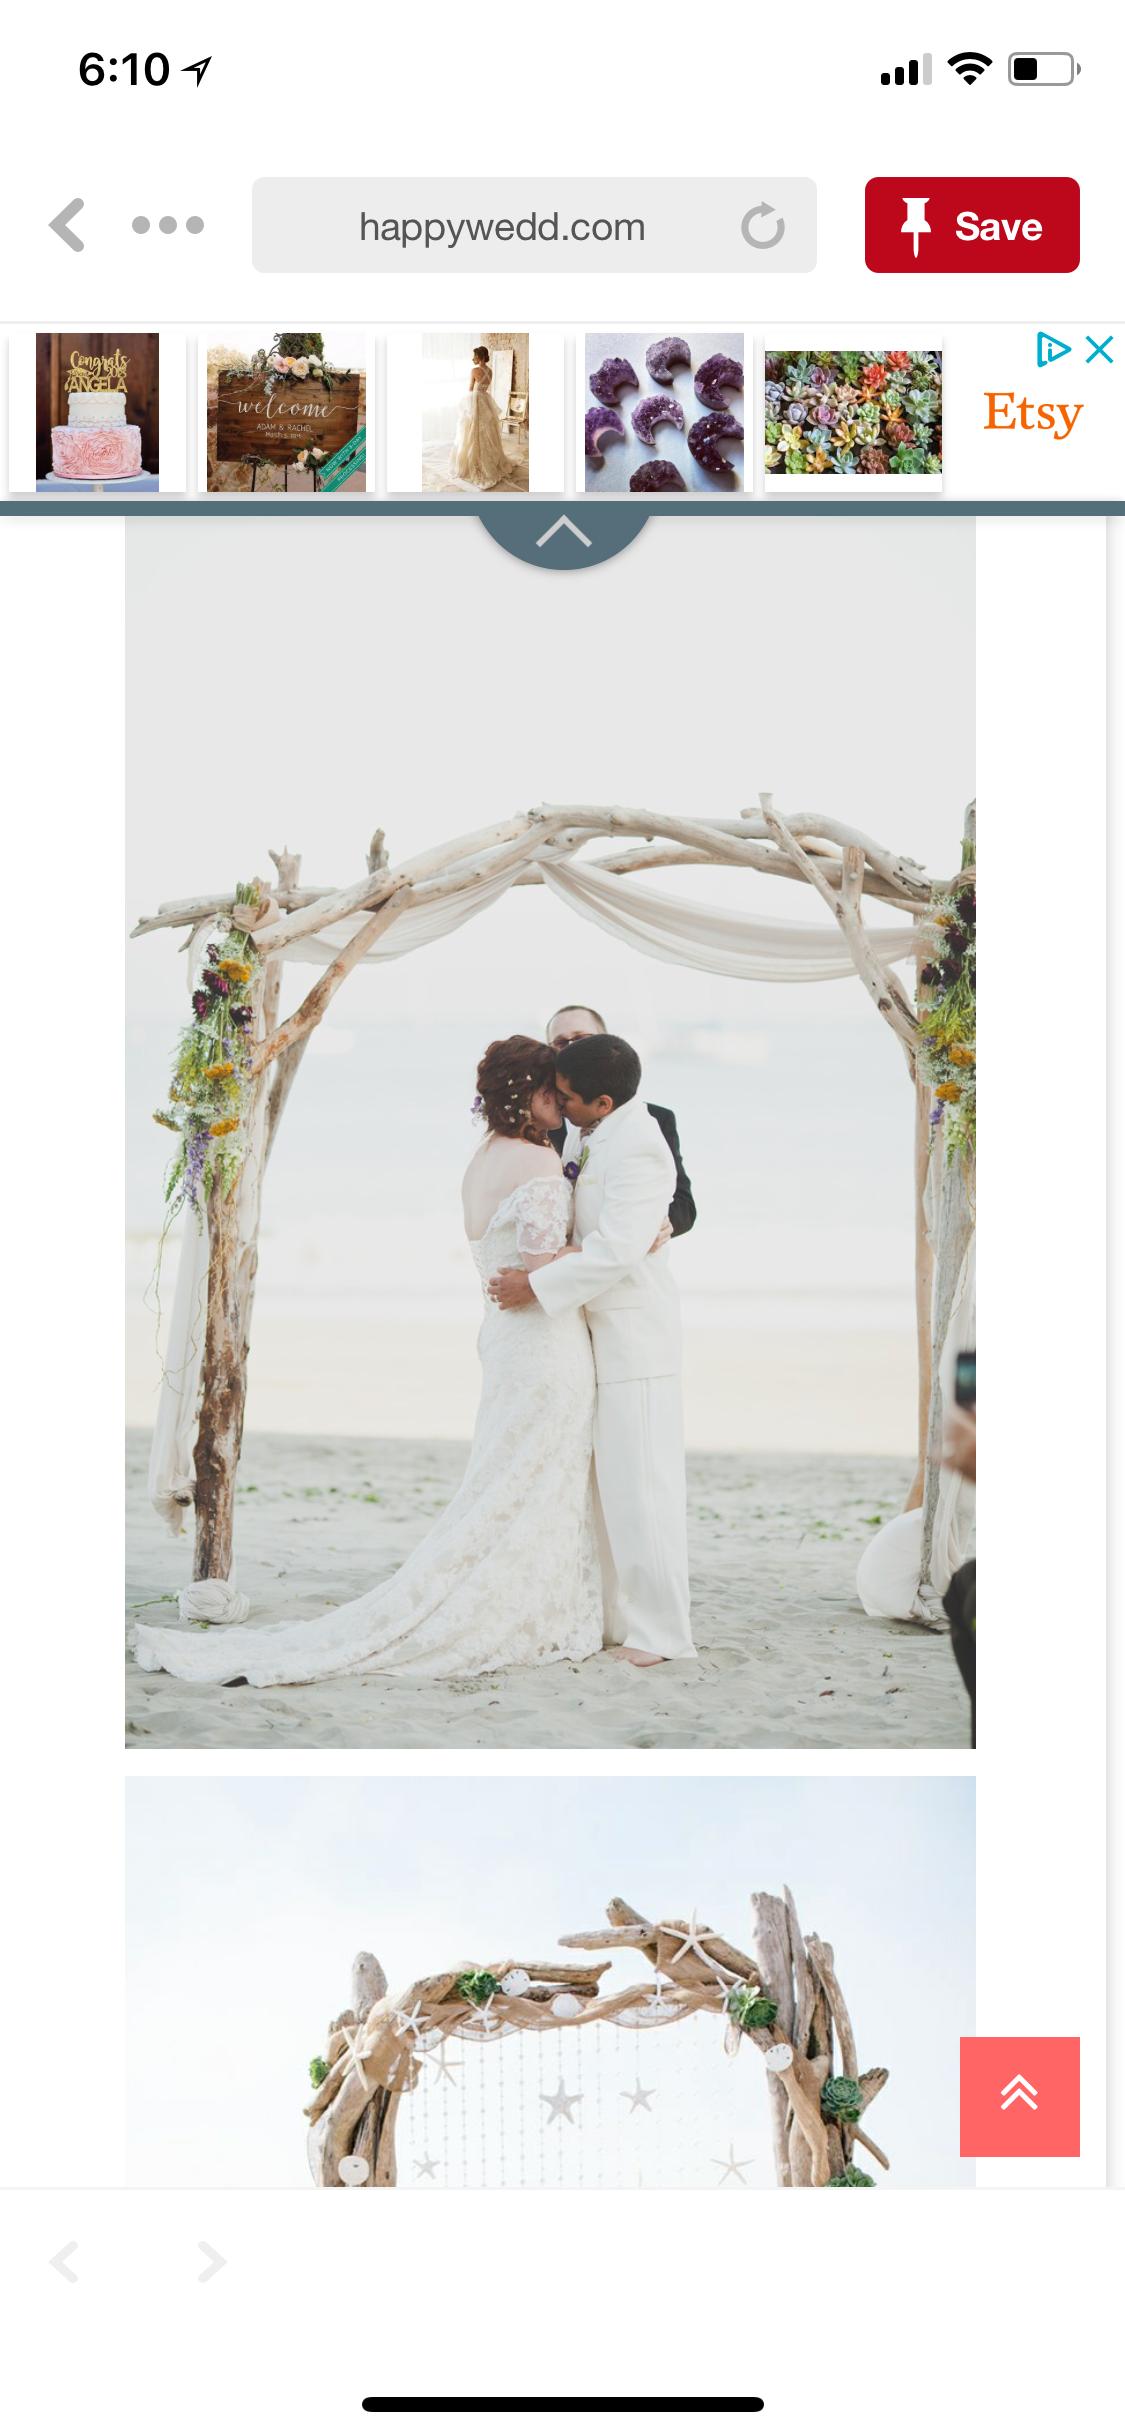 Amy's wedding dress  Pin by Shannon Morris on Amyus Wedding  Pinterest